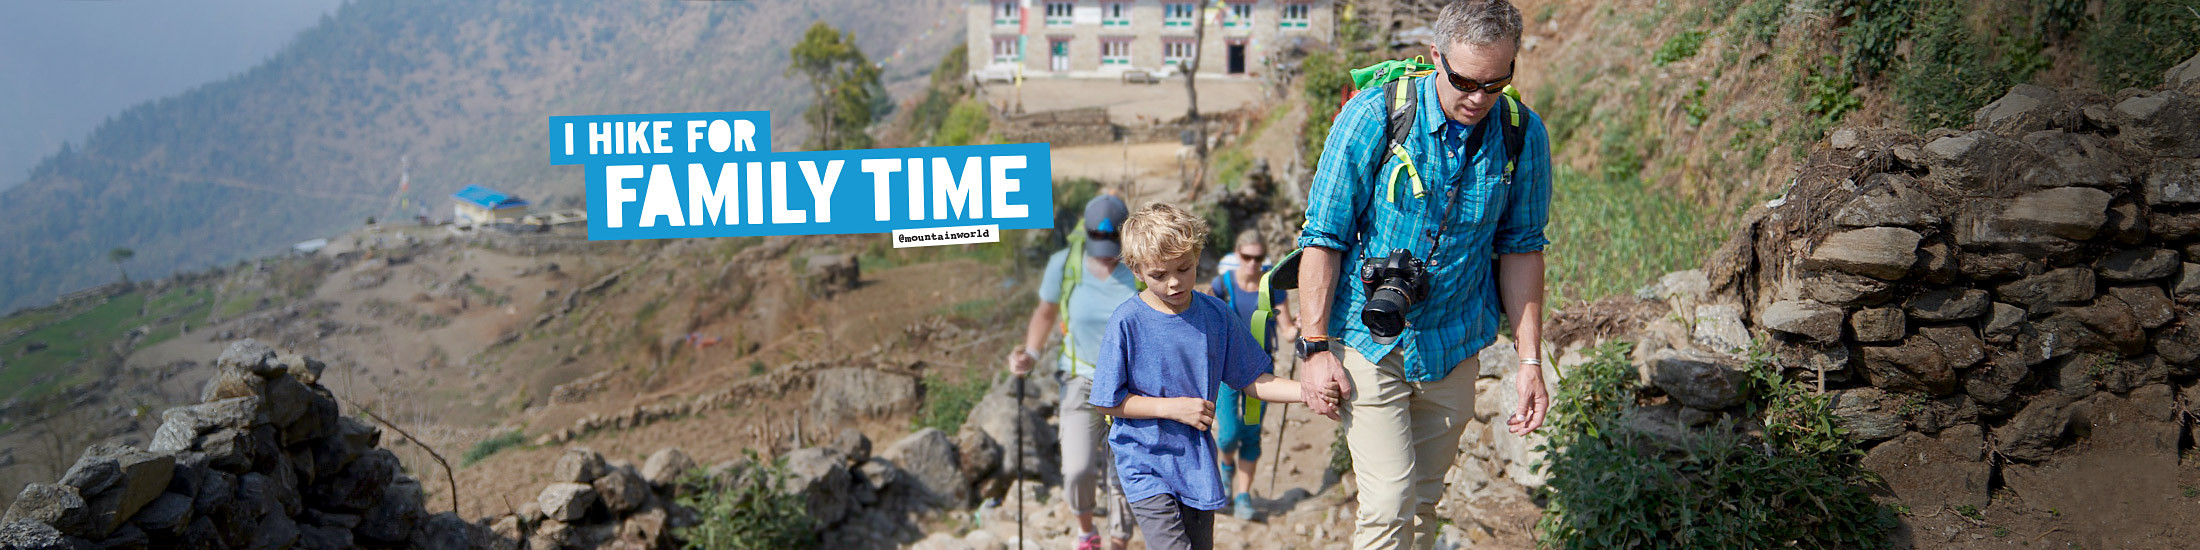 Eddie Bauer alpine guide Jake Norton walks hand in hand with his son in Nepal